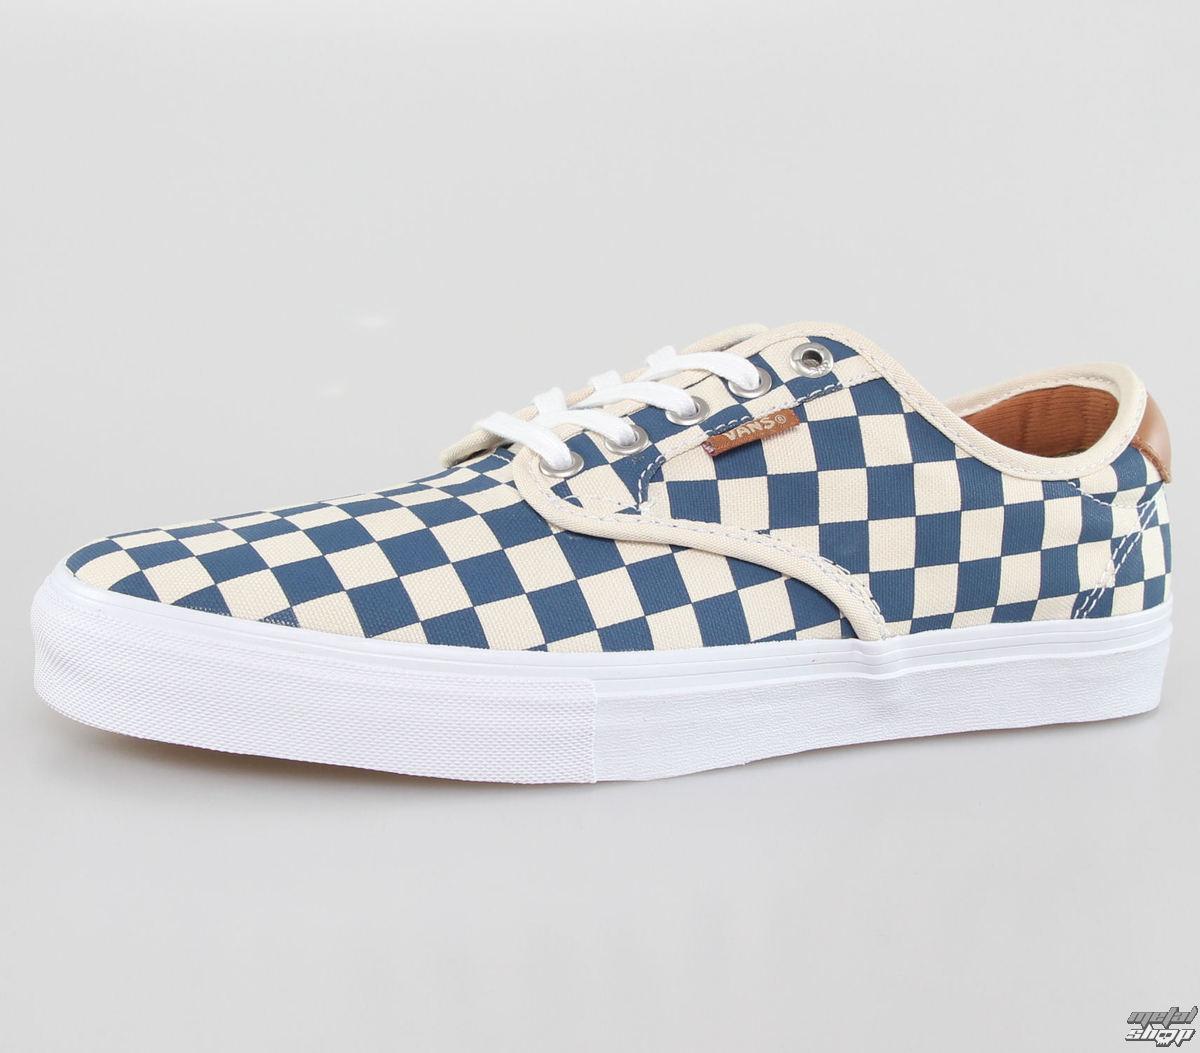 boty pánské VANS - Chima Ferguson Pro (Checkerb Oard) - Tan/Blue - VUARFBU